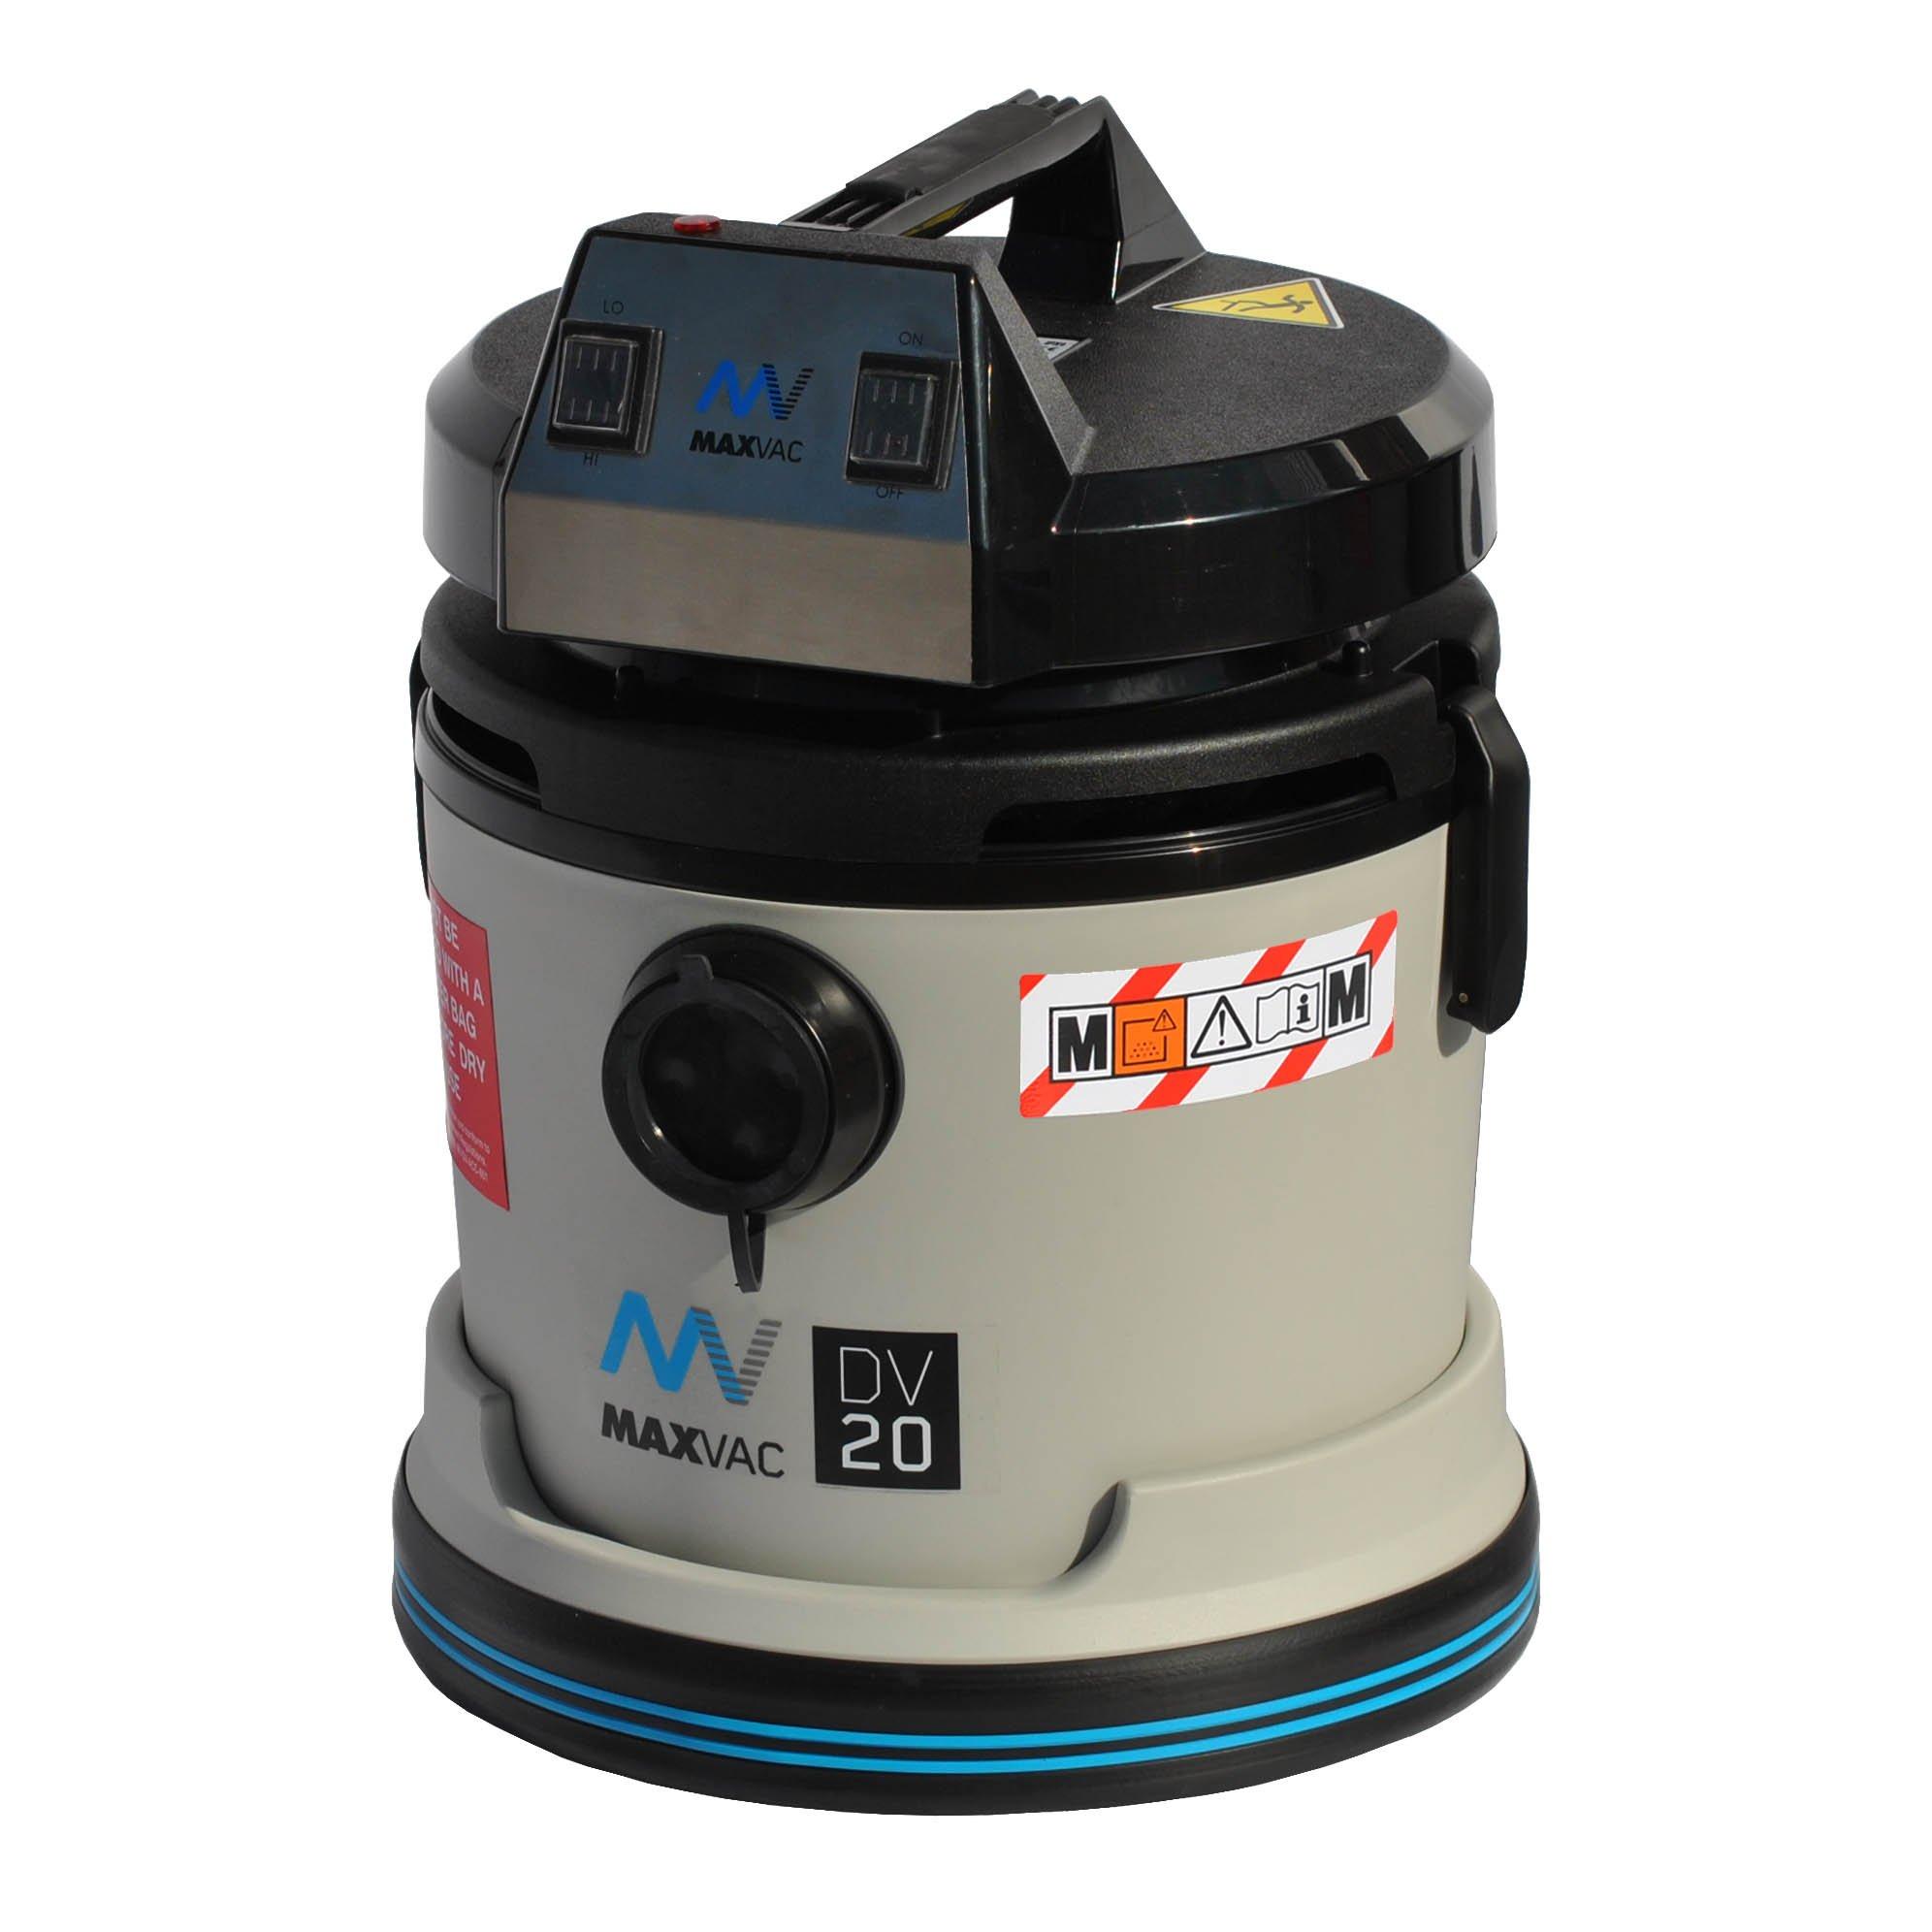 Certified M-Class 20L Vacuum 110V, Wet/Dry MAXVAC Dura DV20-MB